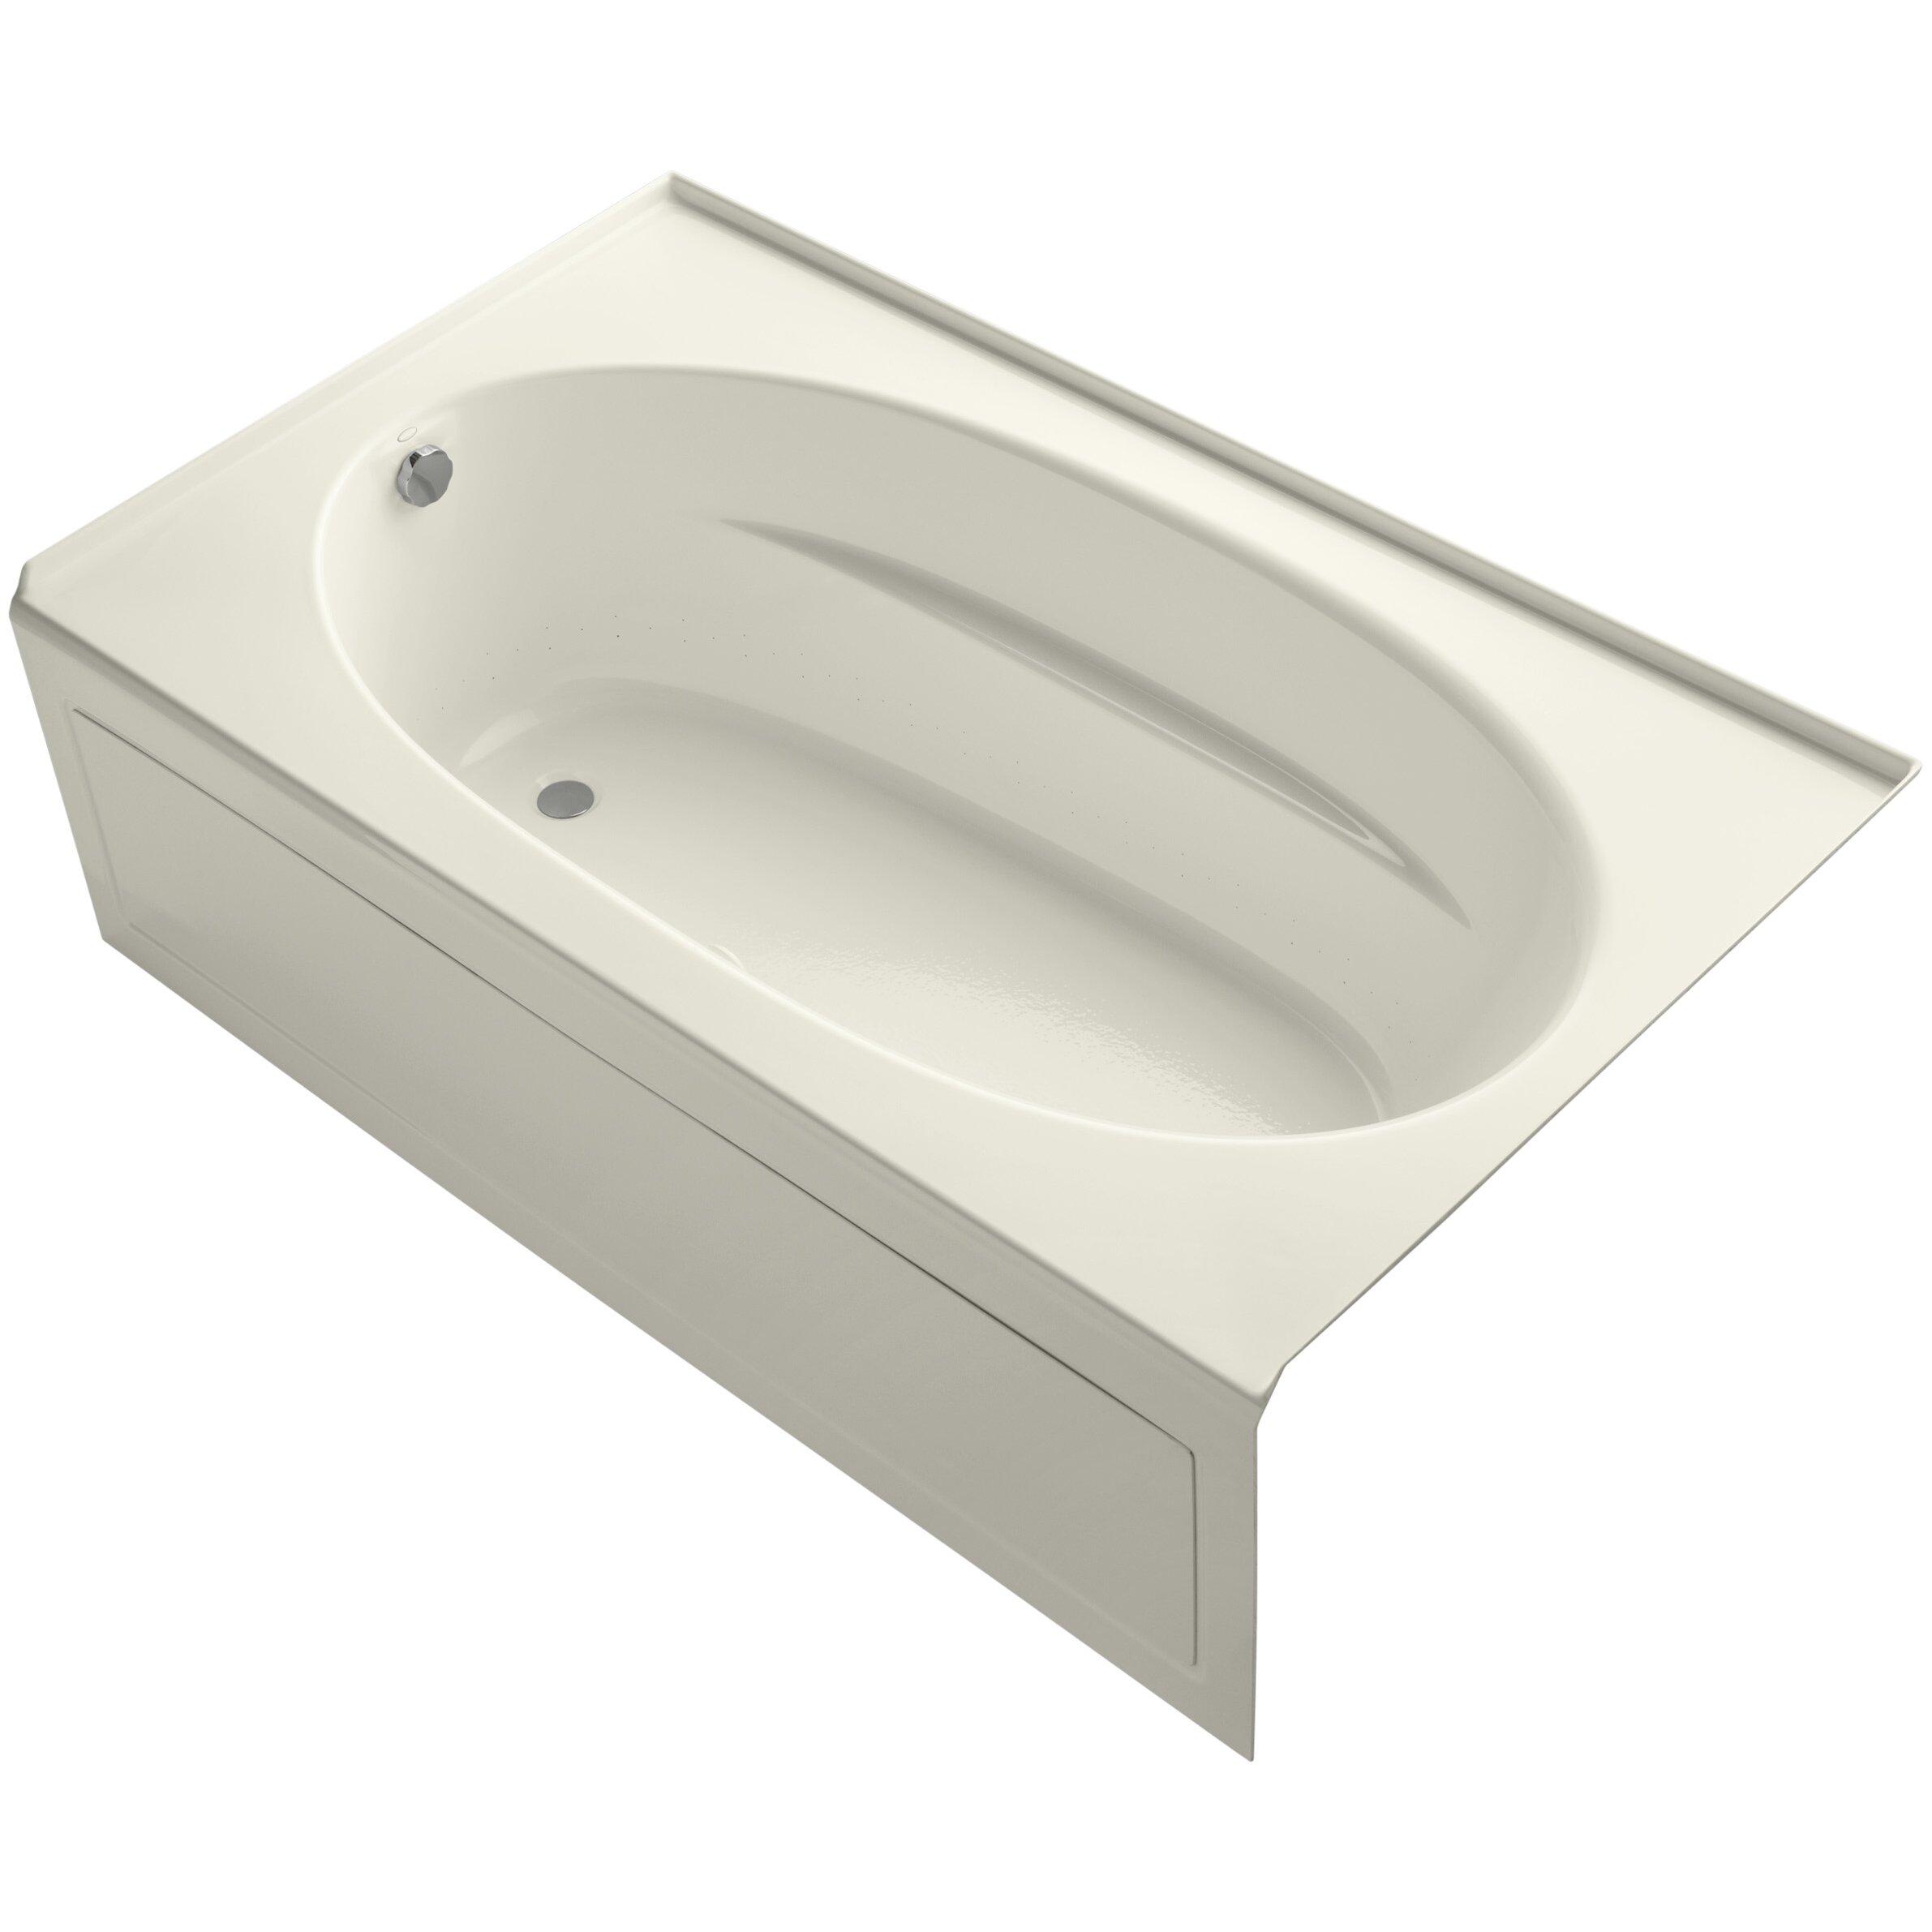 Home Improvement Bathroom Fixtures ... Kohler Part #: K-1114-GLA SKU ...